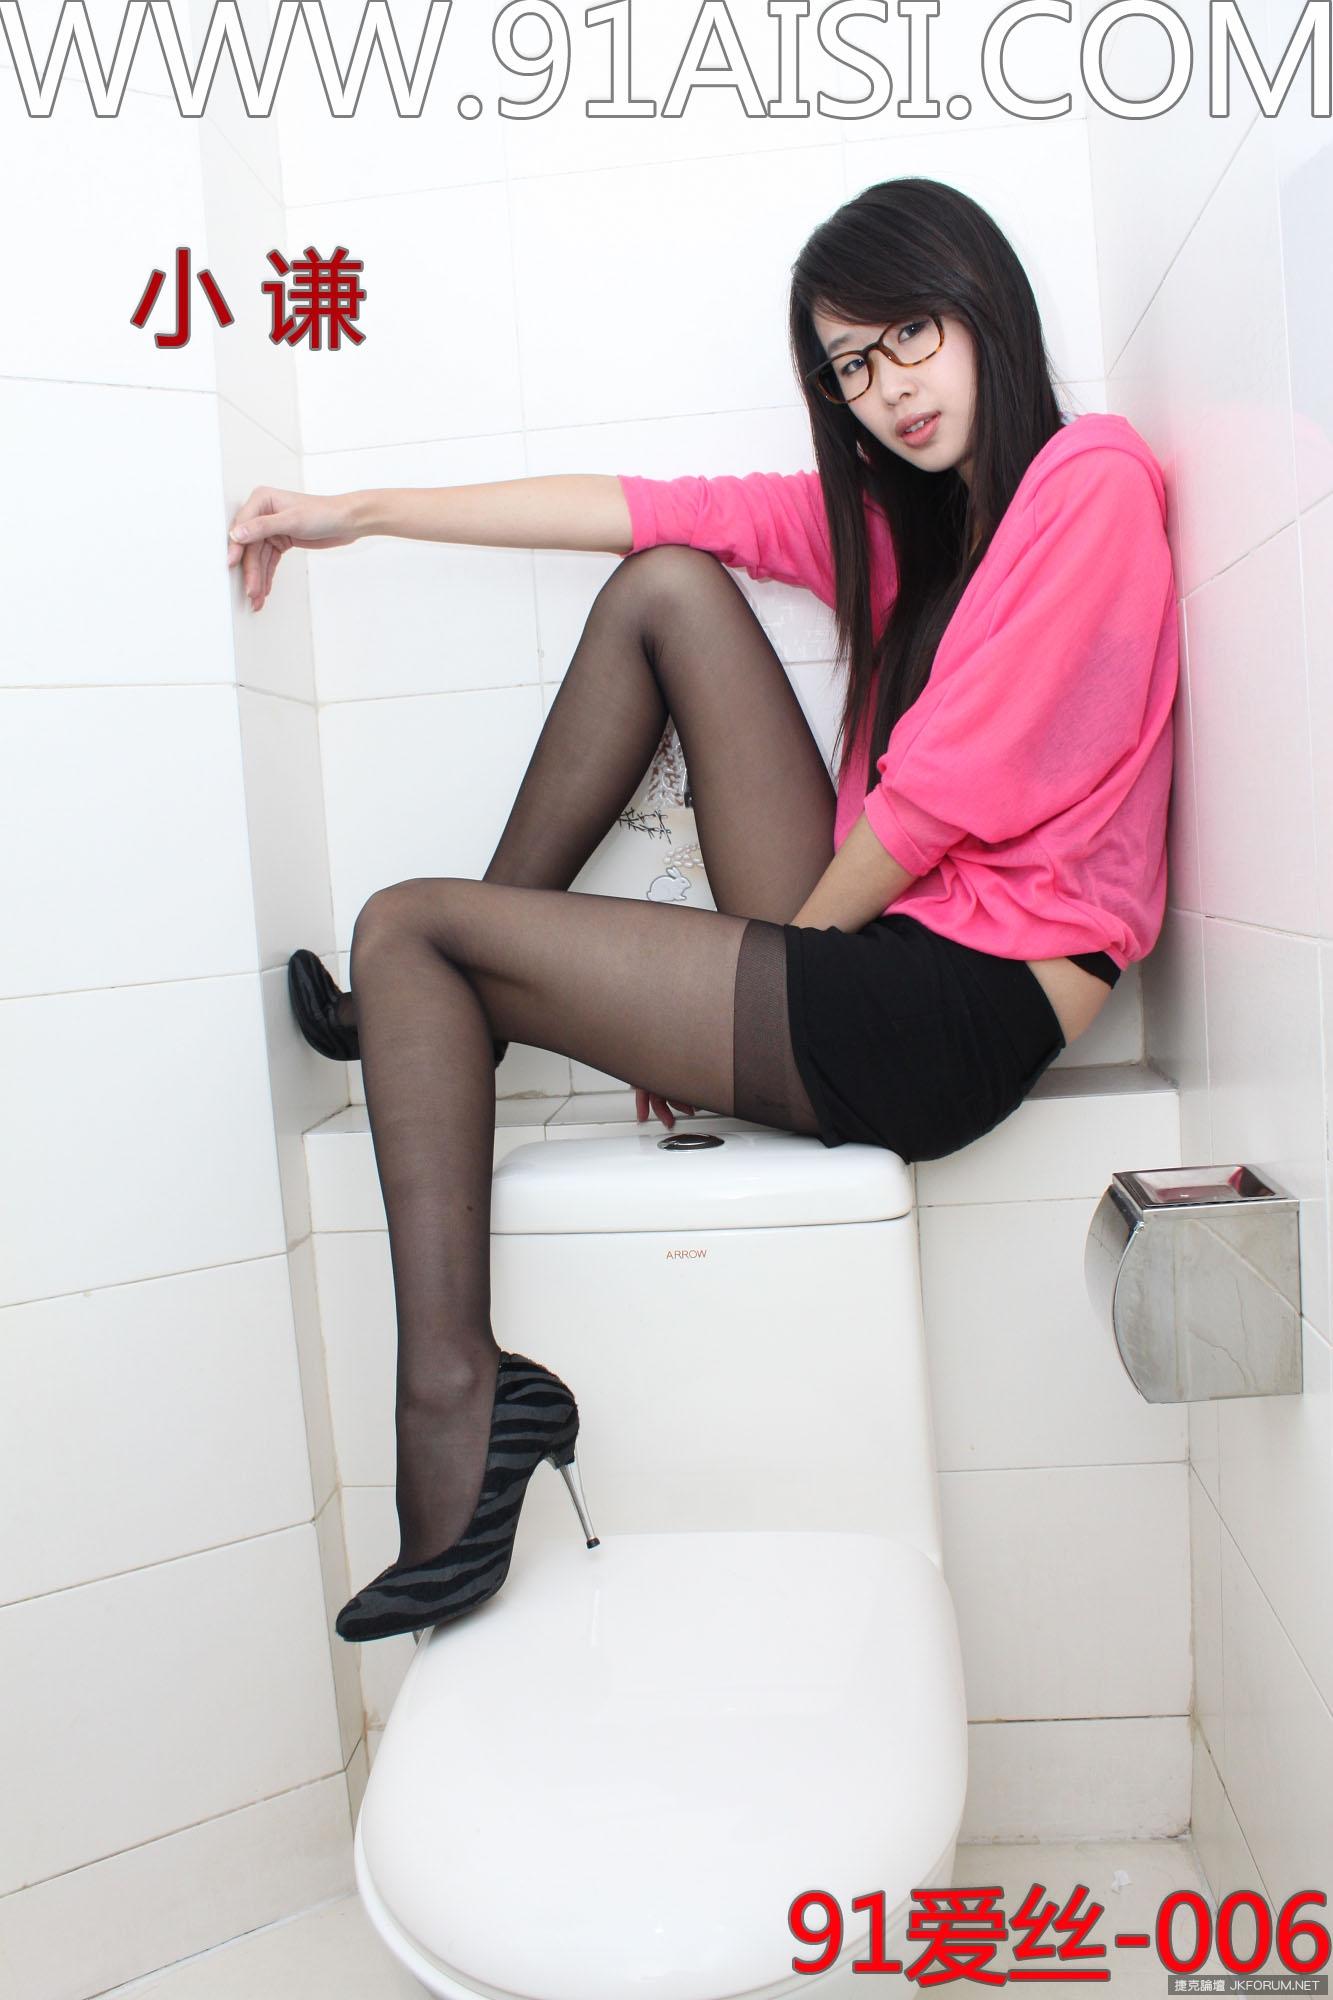 【91AISI系列】NO.006 小謙 寫真美腿【39P】 - 貼圖 - 絲襪美腿 -